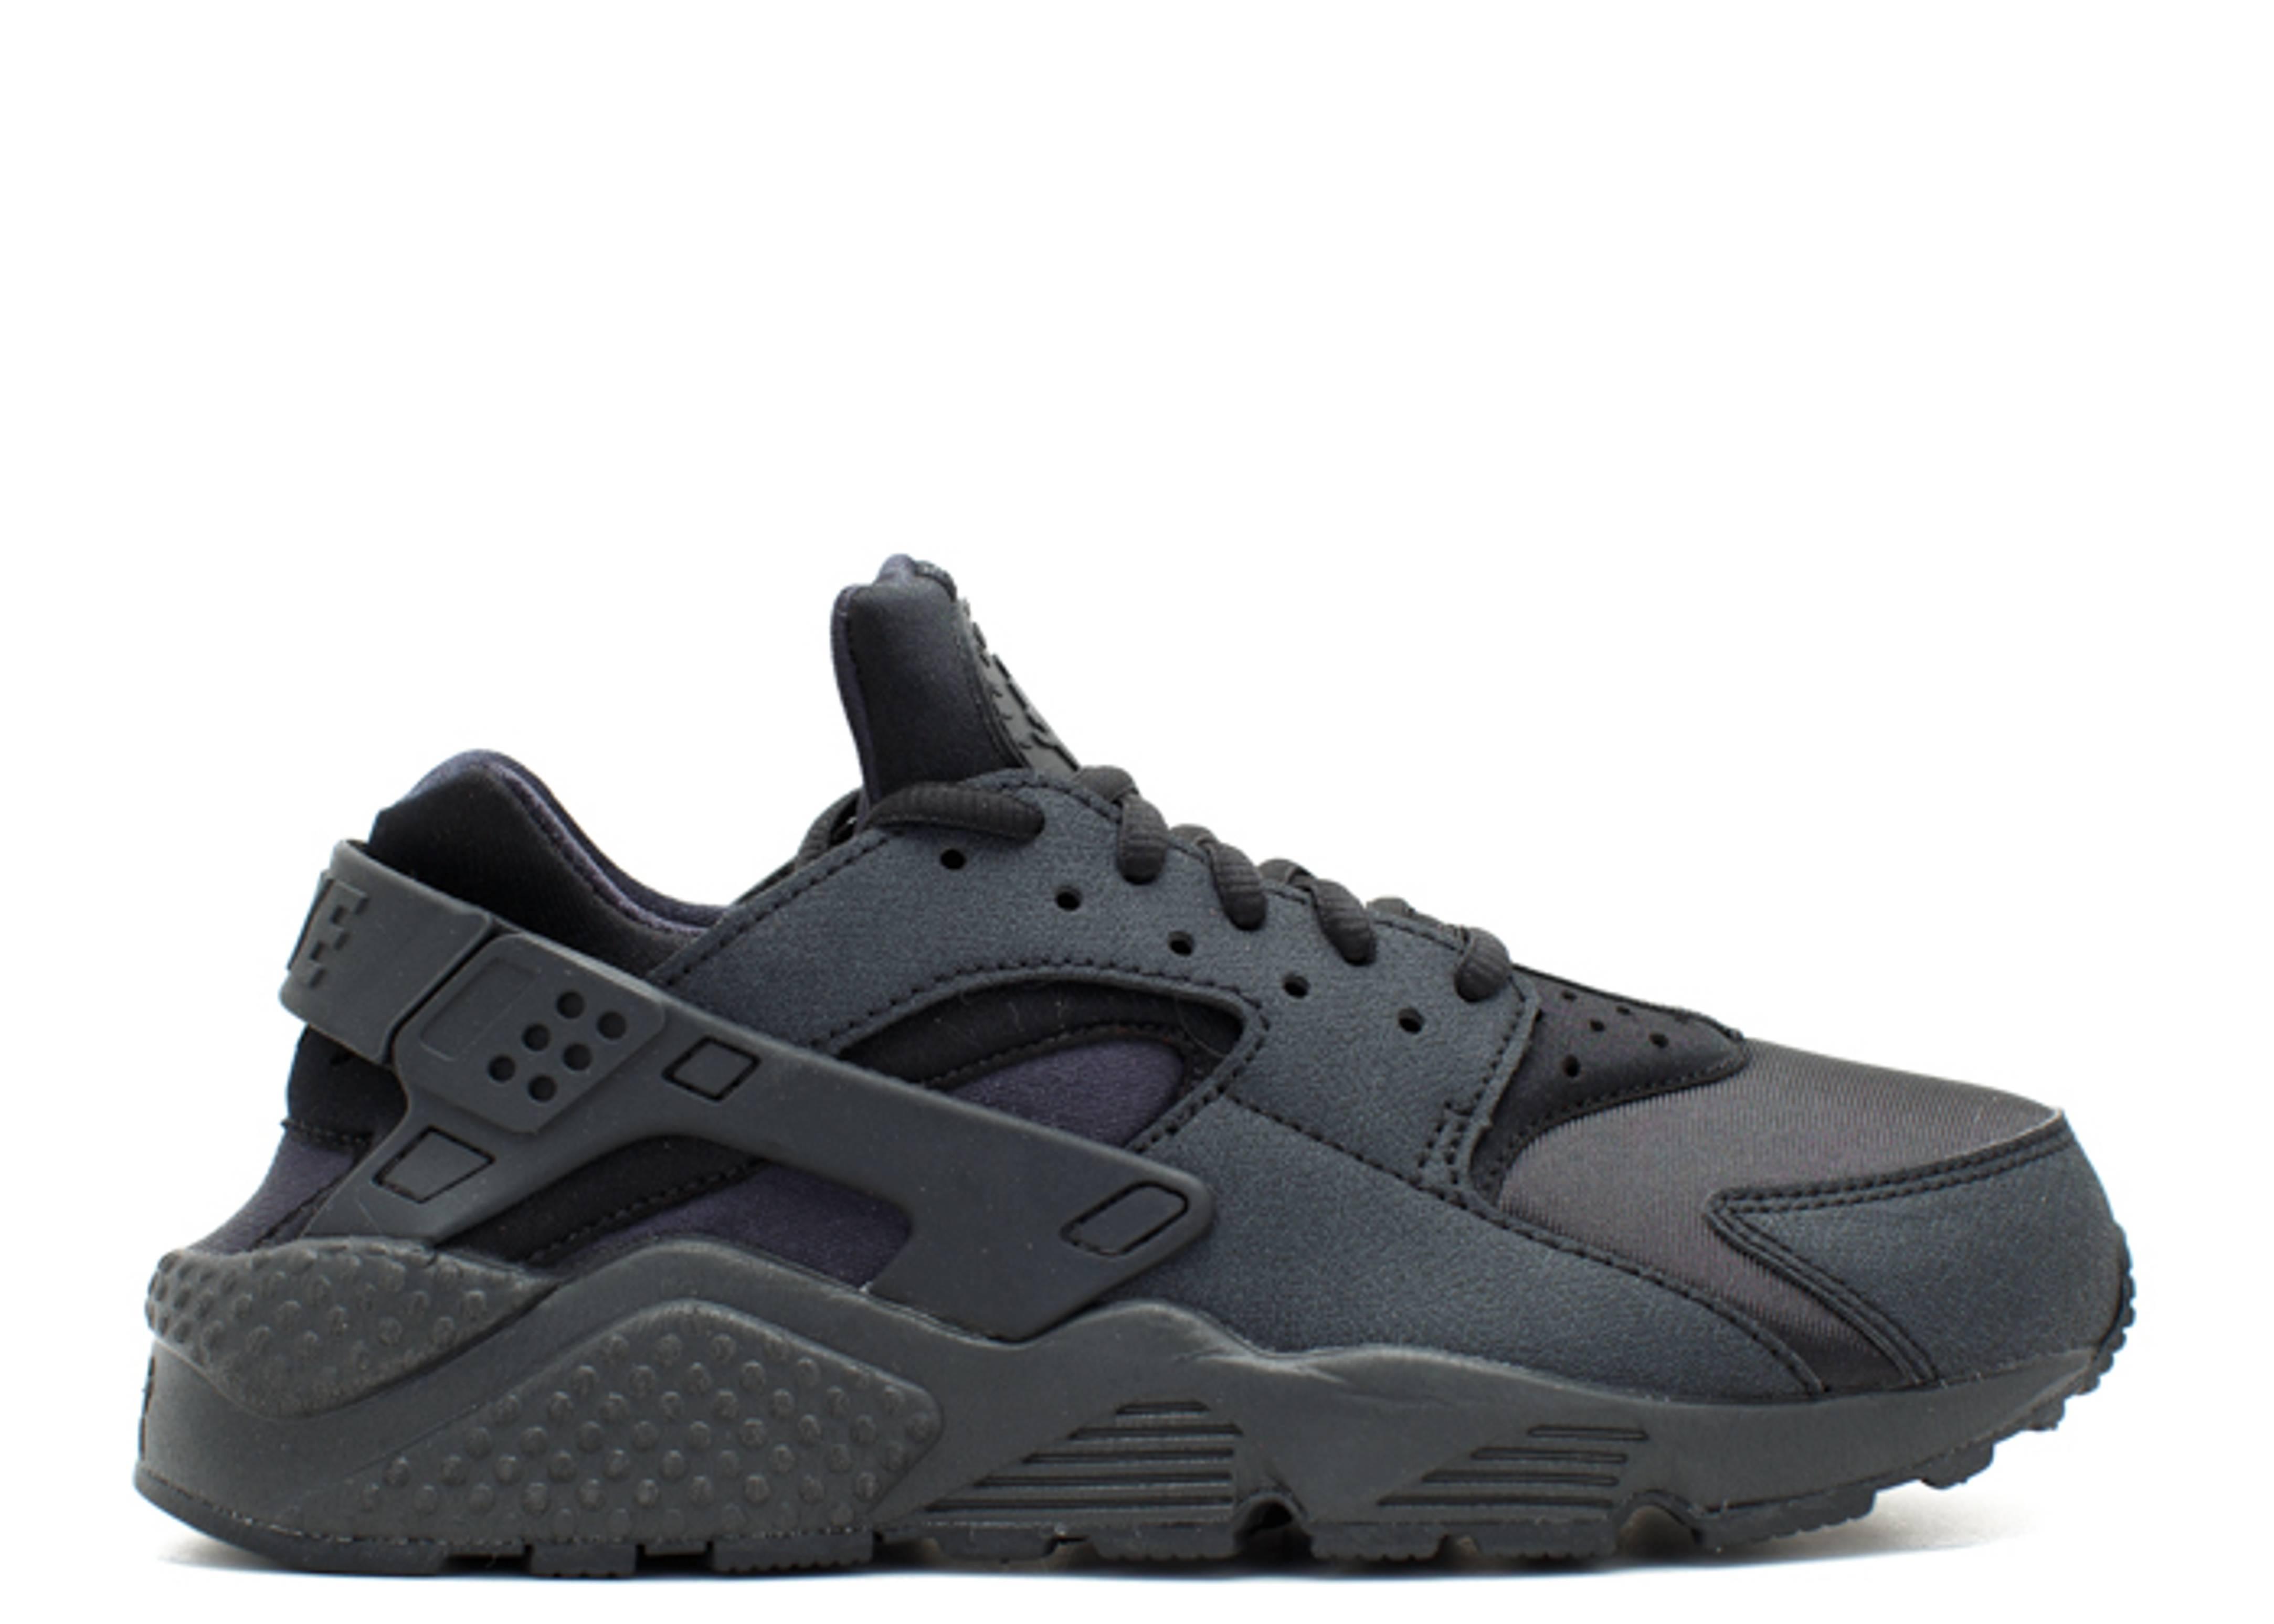 W s Air Huarache Run - Nike - 634835 009 - black black  f2f39e854f